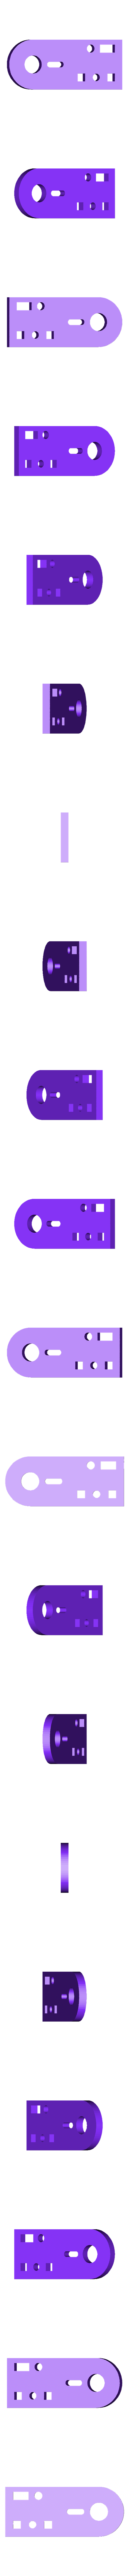 Leg_Top_Pivot_Plate.stl Download free STL file mePed Quadruped Robot • 3D printing template, MinorSymphony